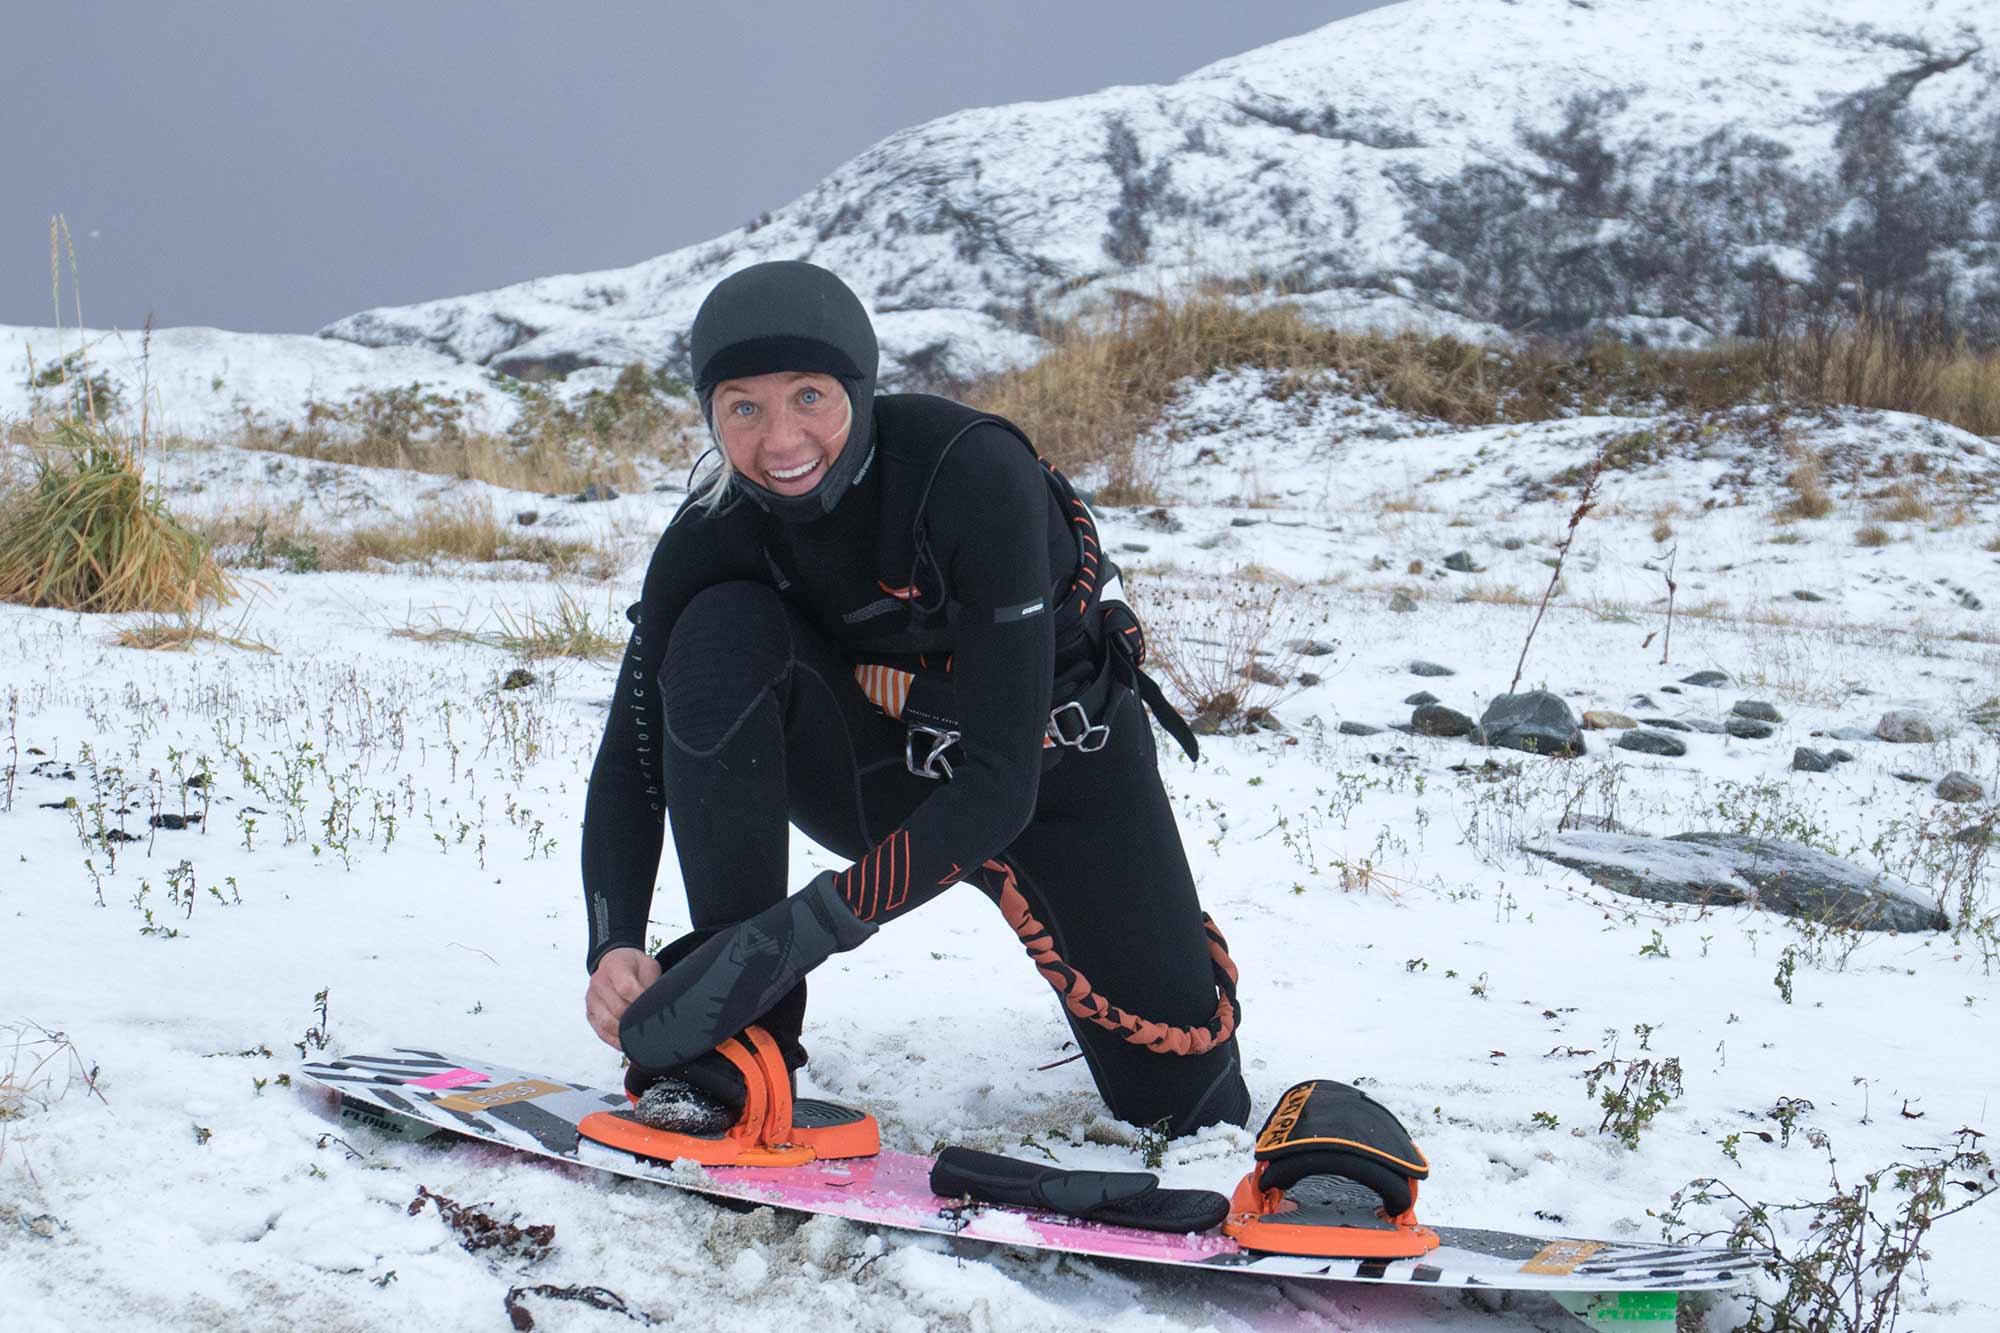 Kari Schibevaag beim Snowkiten